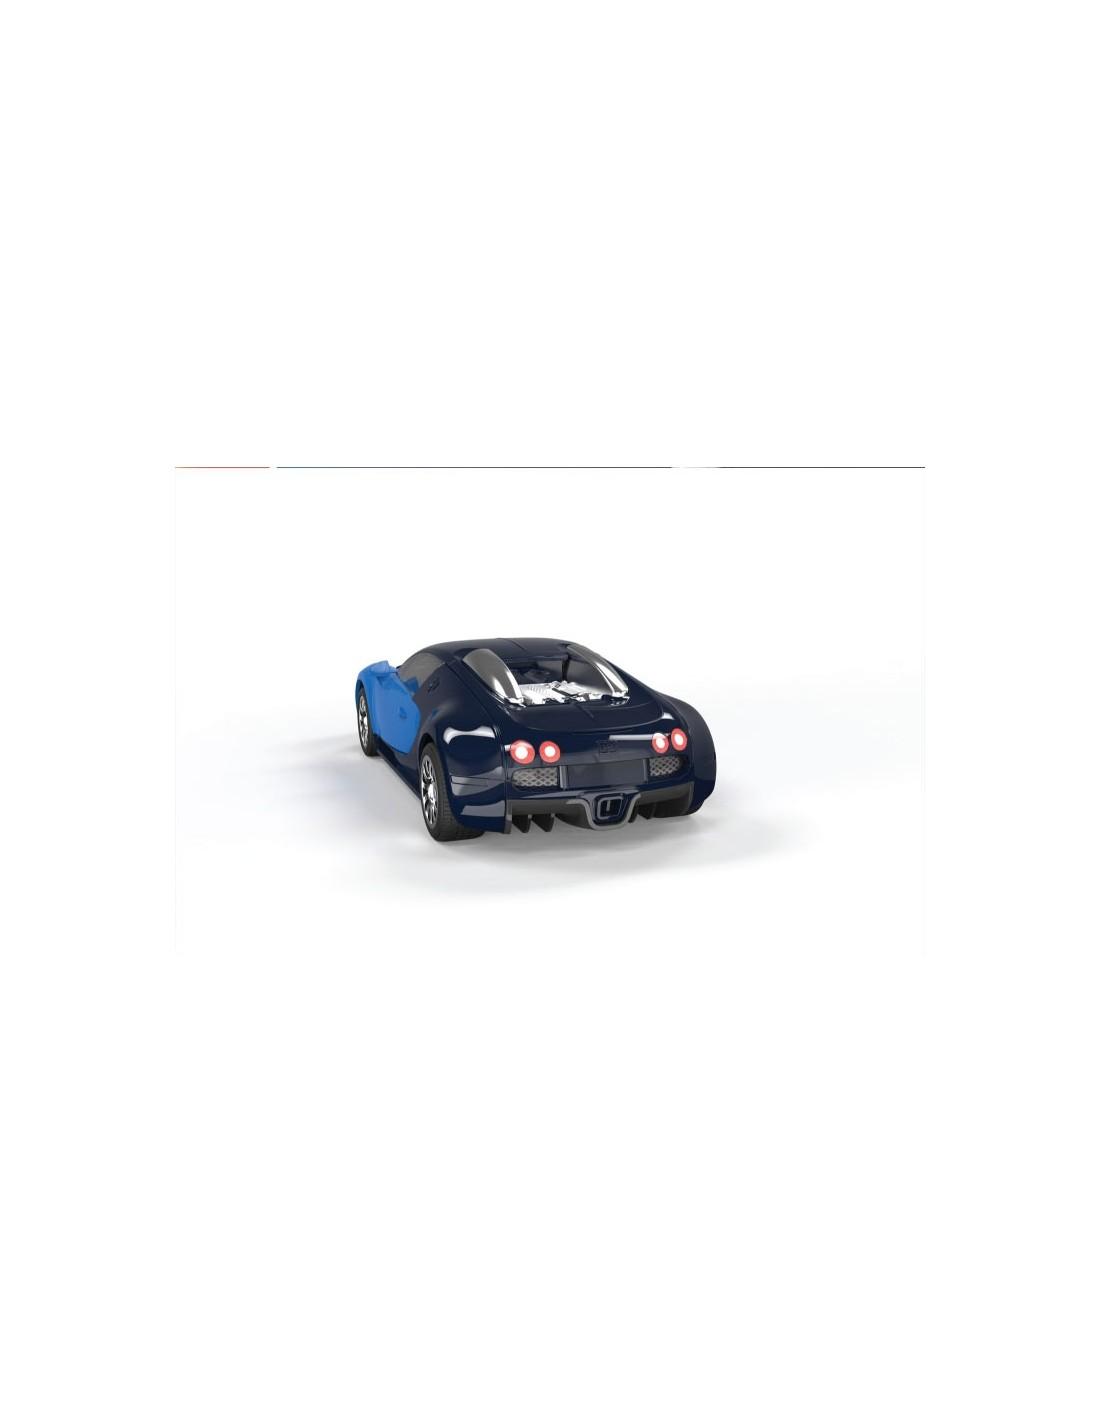 airfix quick build bugatti veyron. Black Bedroom Furniture Sets. Home Design Ideas